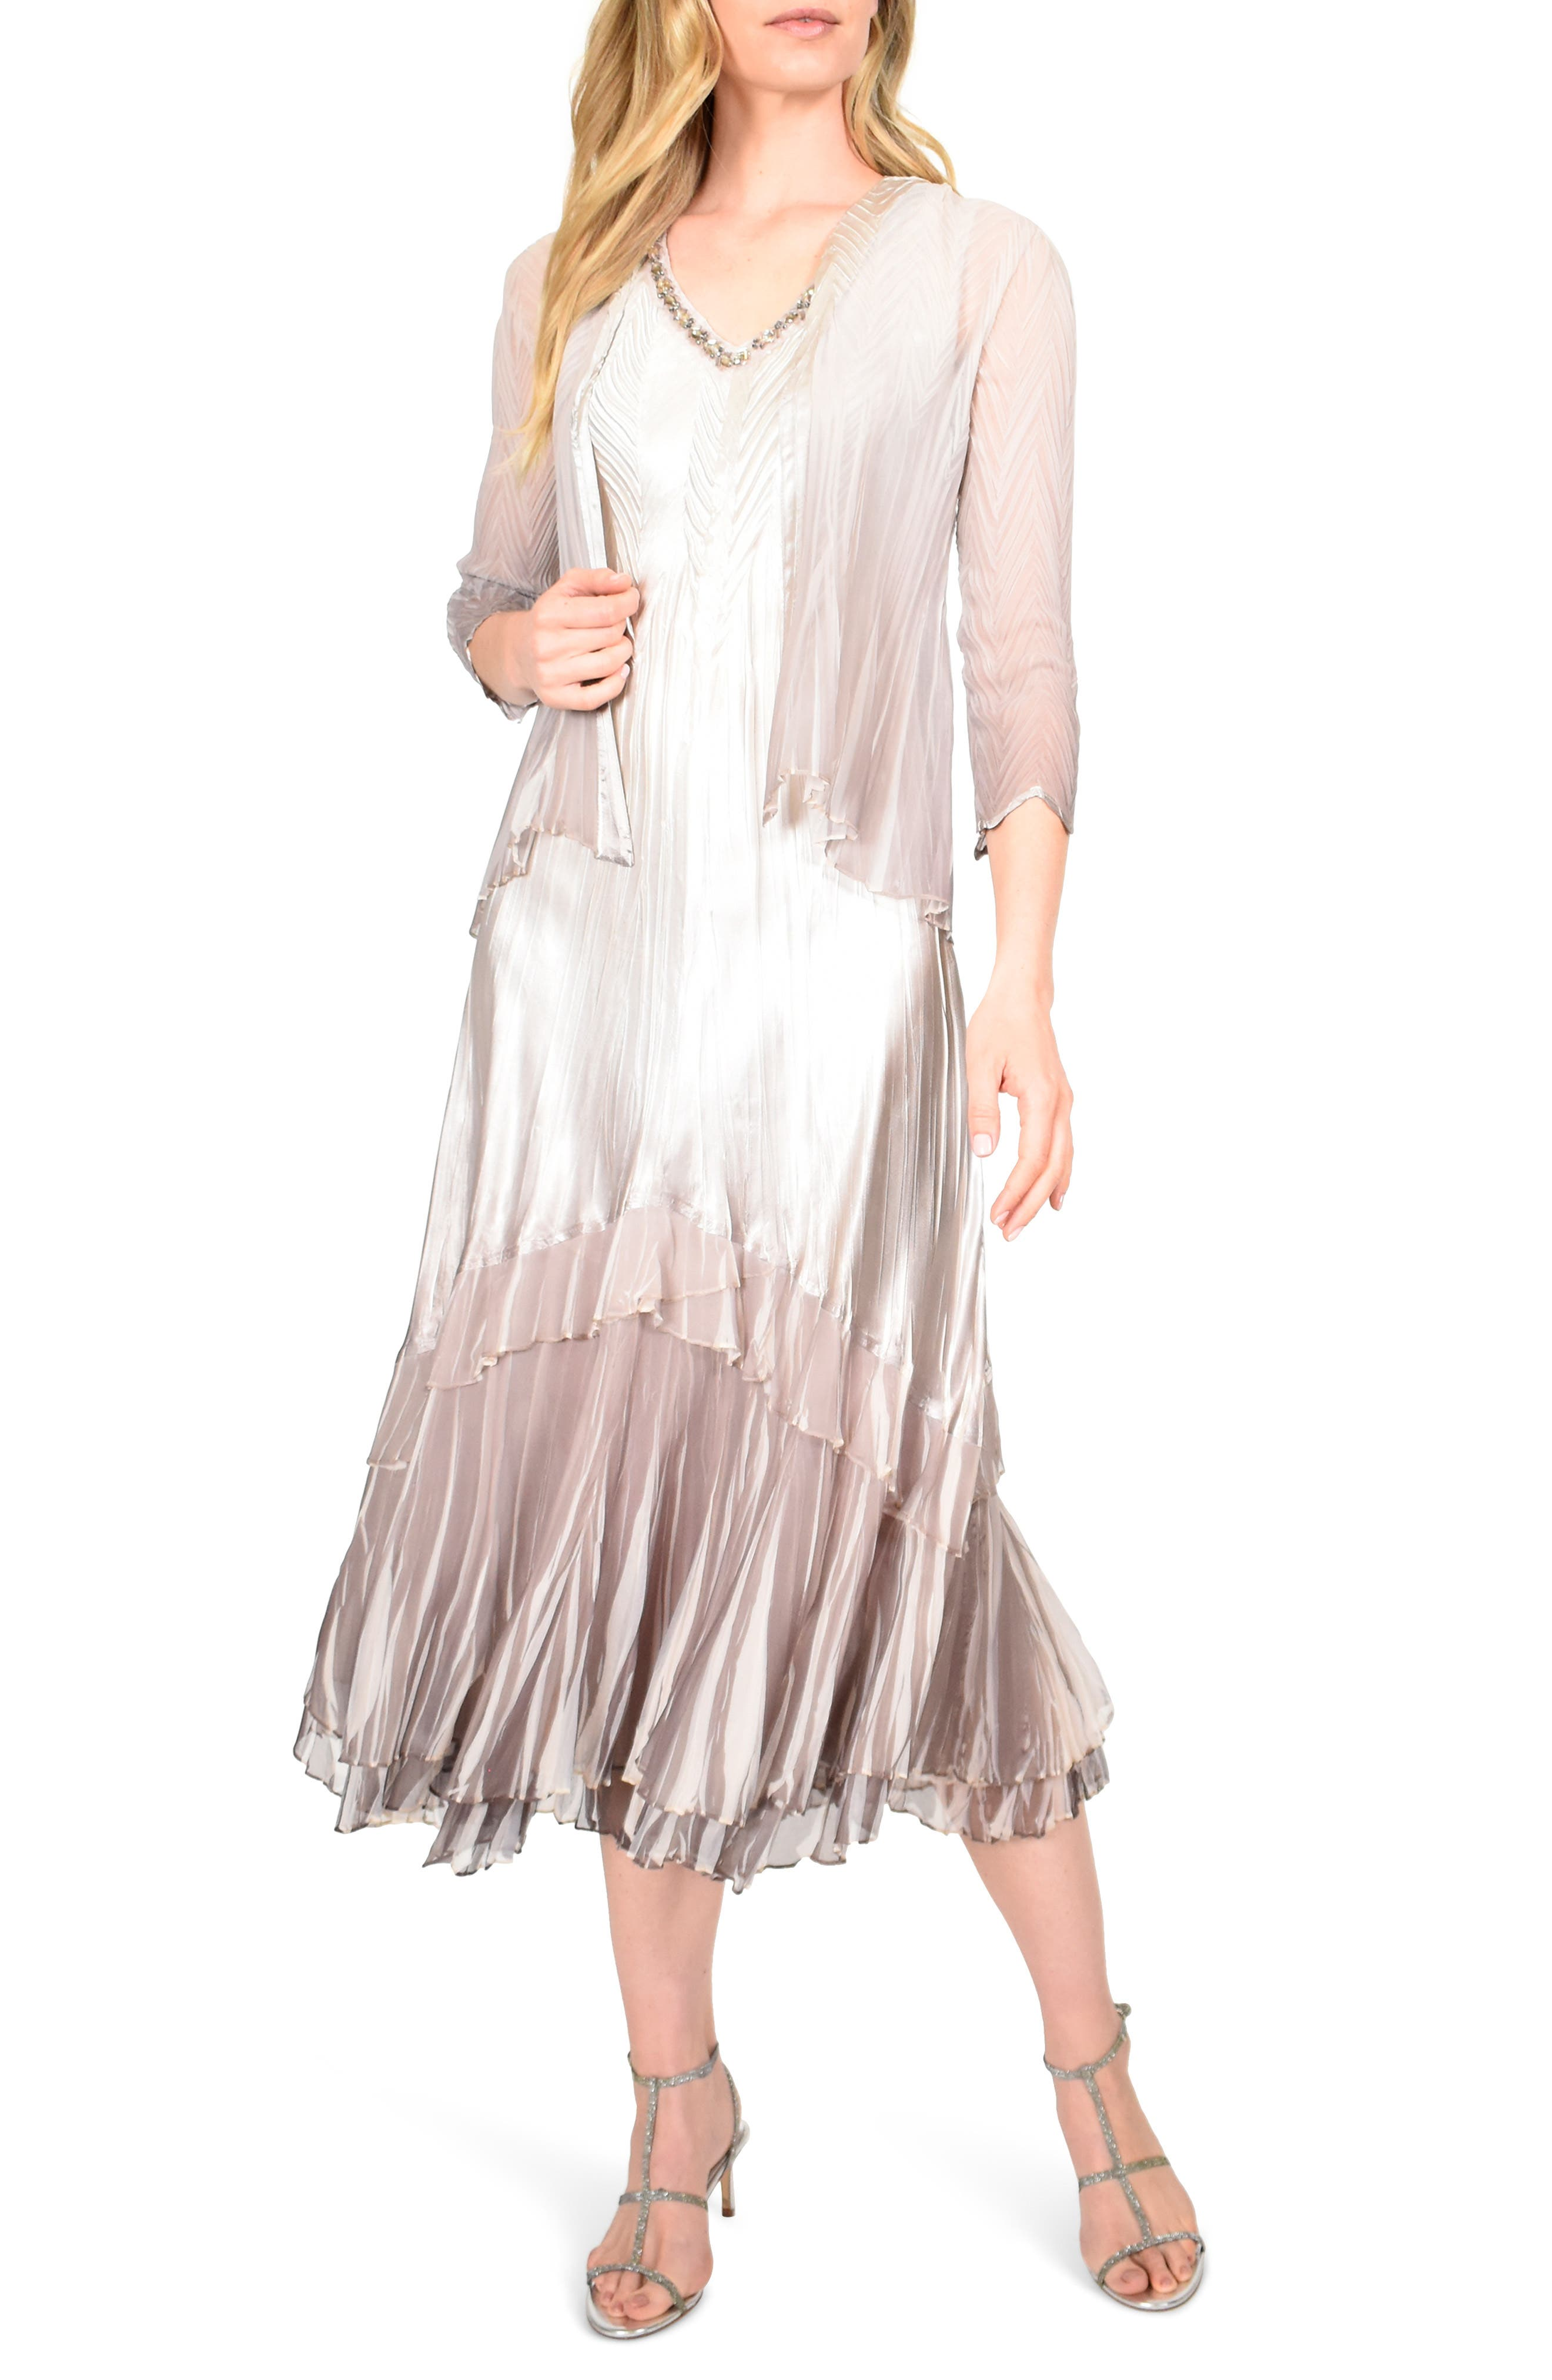 Downton Abbey Inspired Dresses Womens Komarov Floral Charmeuse  Chiffon Jacket Dress Size X-Large - Beige $458.00 AT vintagedancer.com